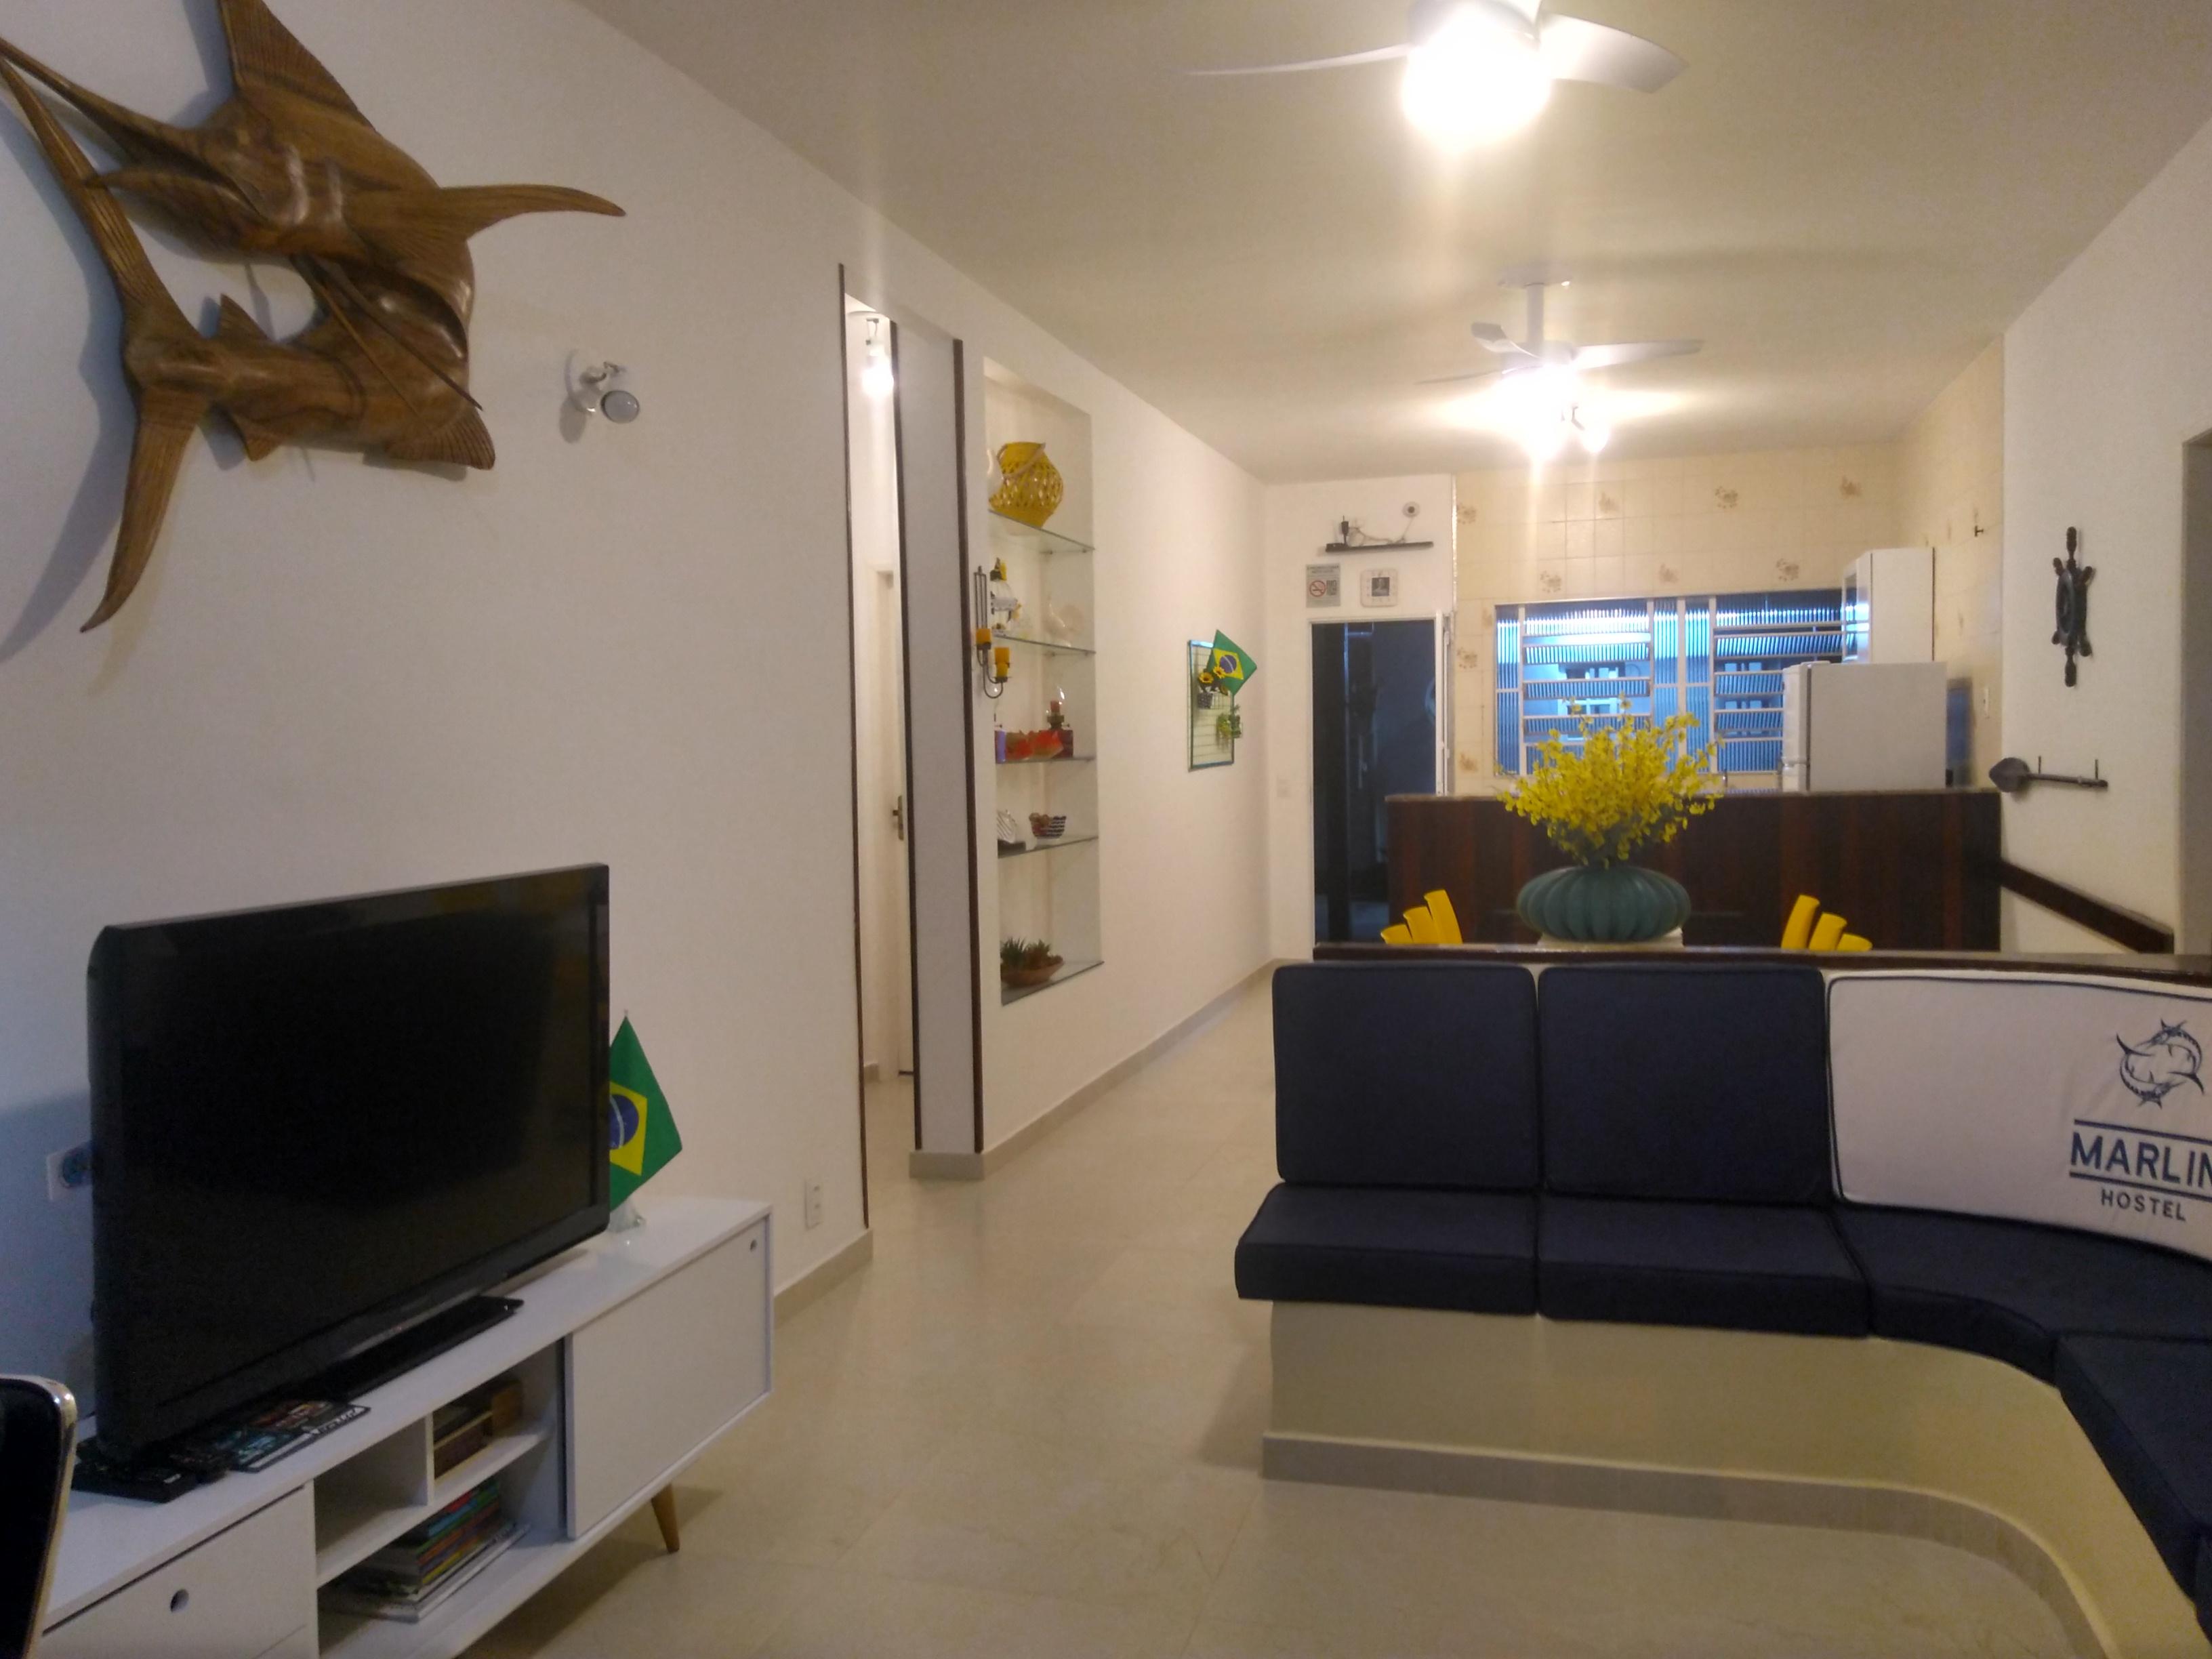 Marlin Hostel Ilha Grande